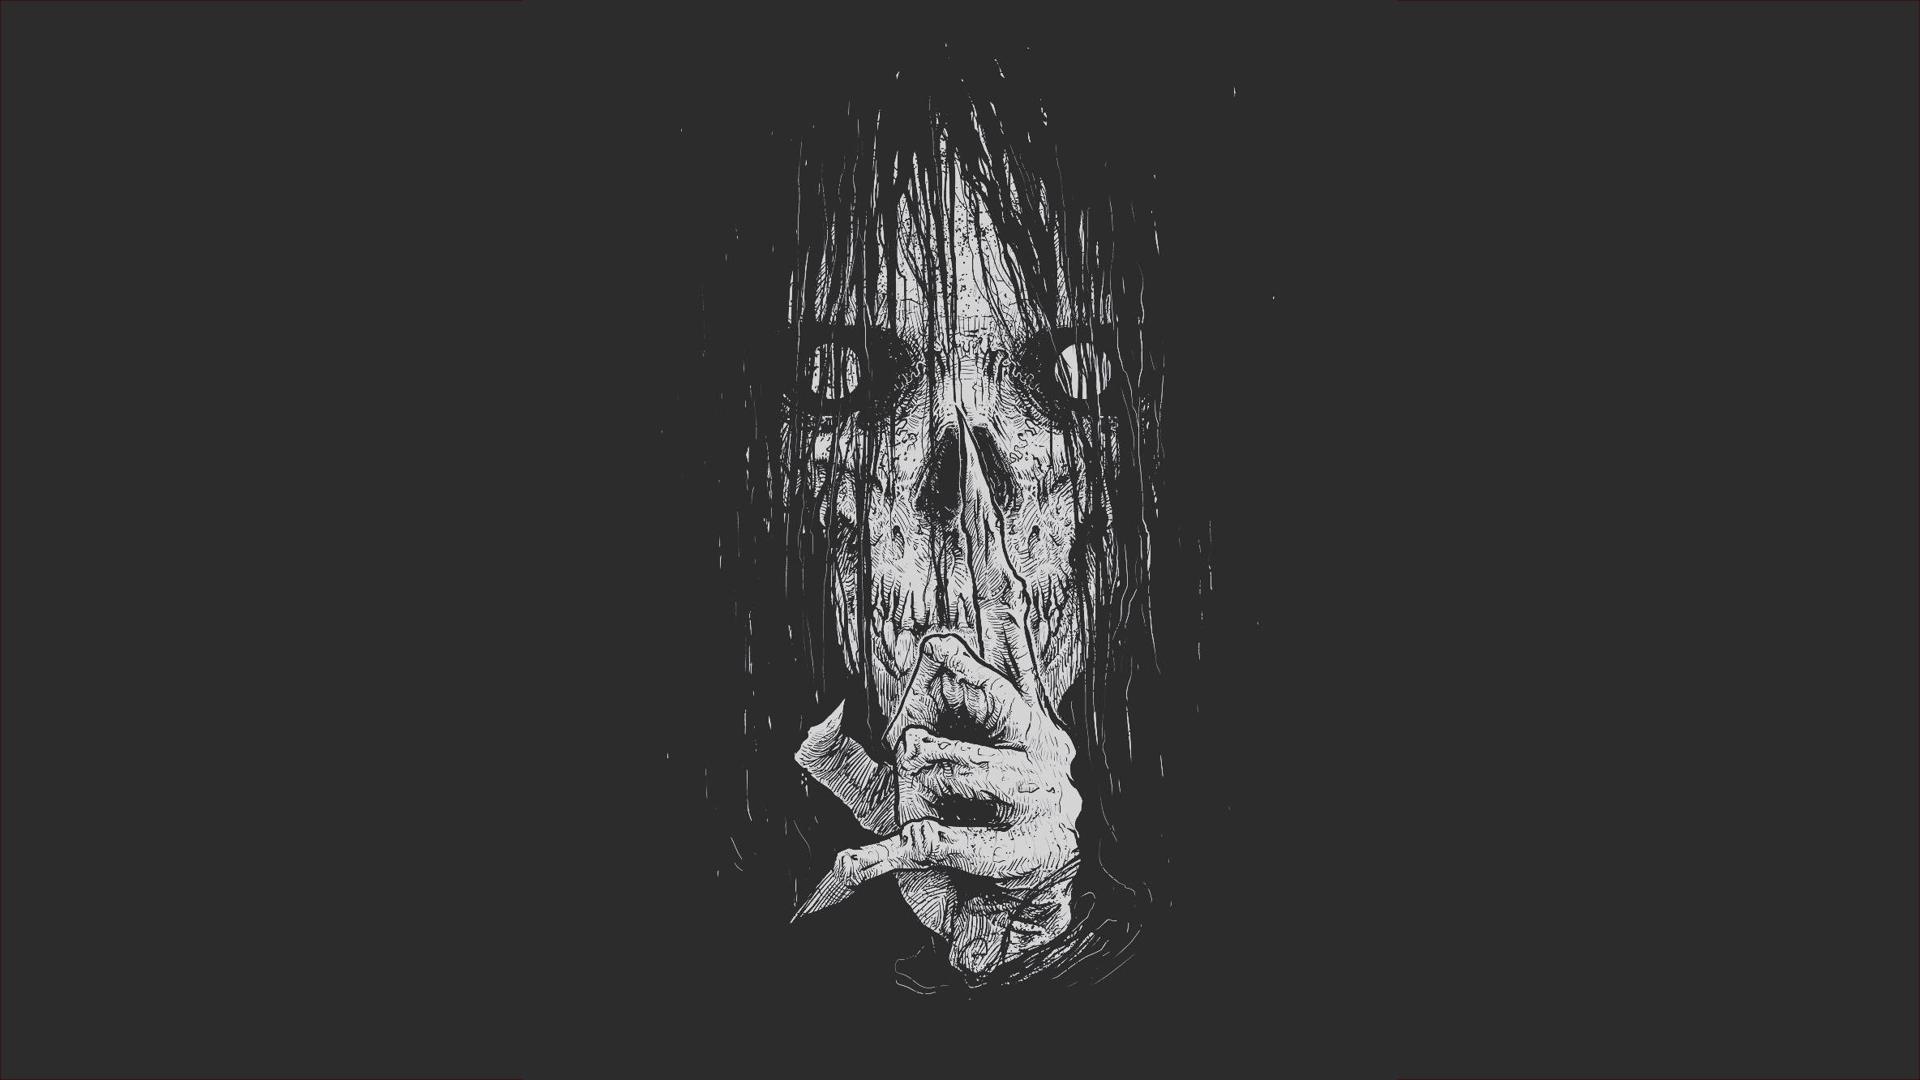 General 1920x1080 digital art artwork simple background dark skull fingers creepy scary face